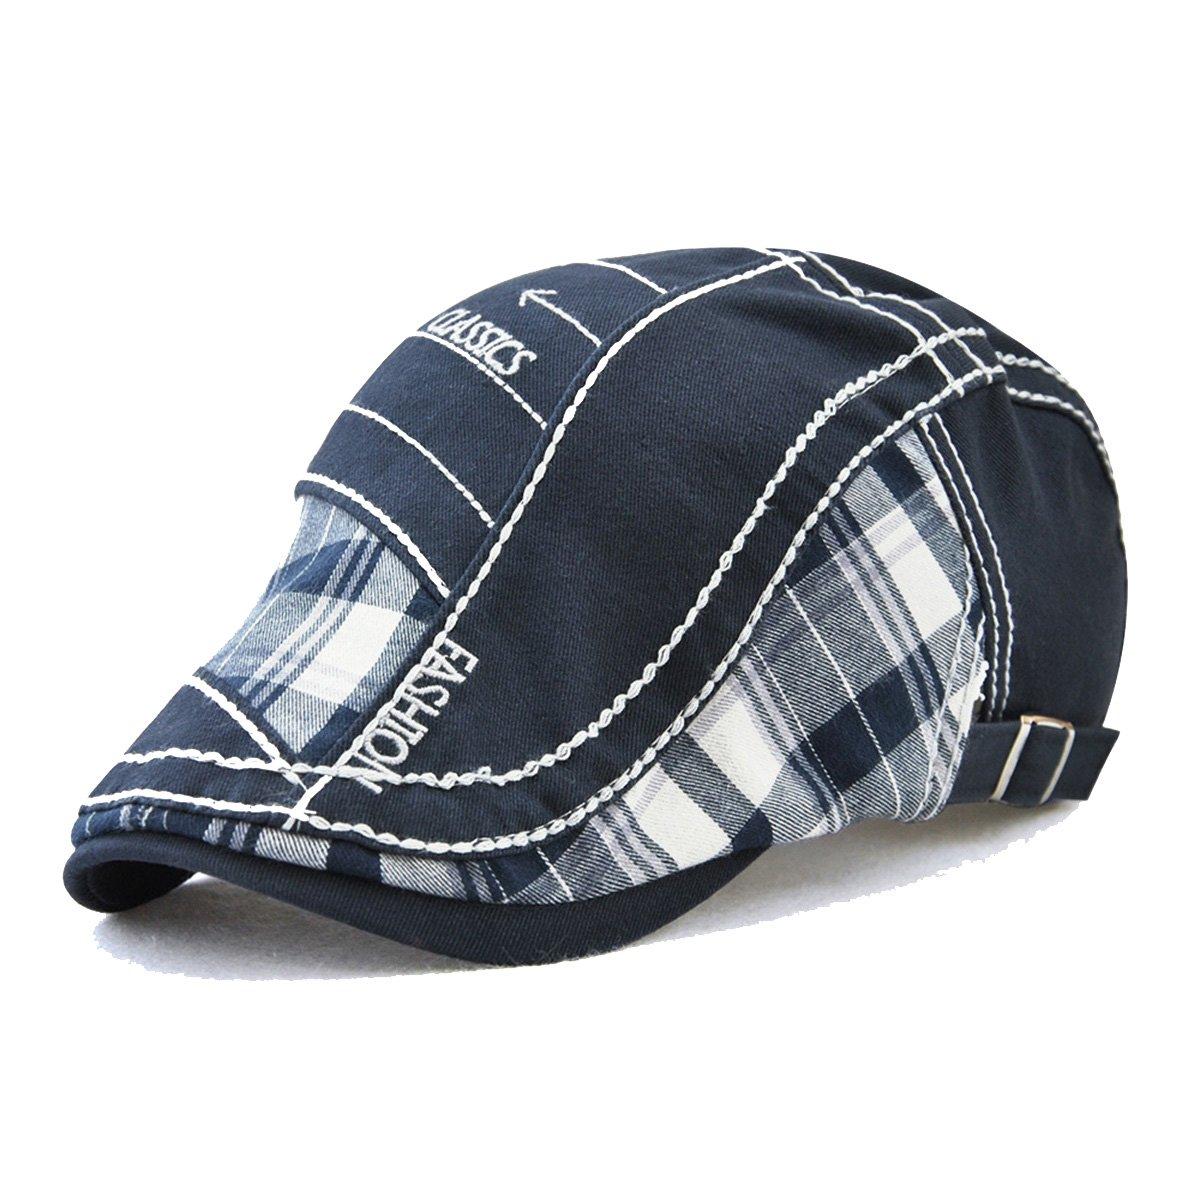 00b37df816a22 Galleon - FayTop Men s Women s Newsboy Cap Ivy Irish Flat Hat Cabbie Scally  Cap Cabbie Driving Caps Hats E12942-blue